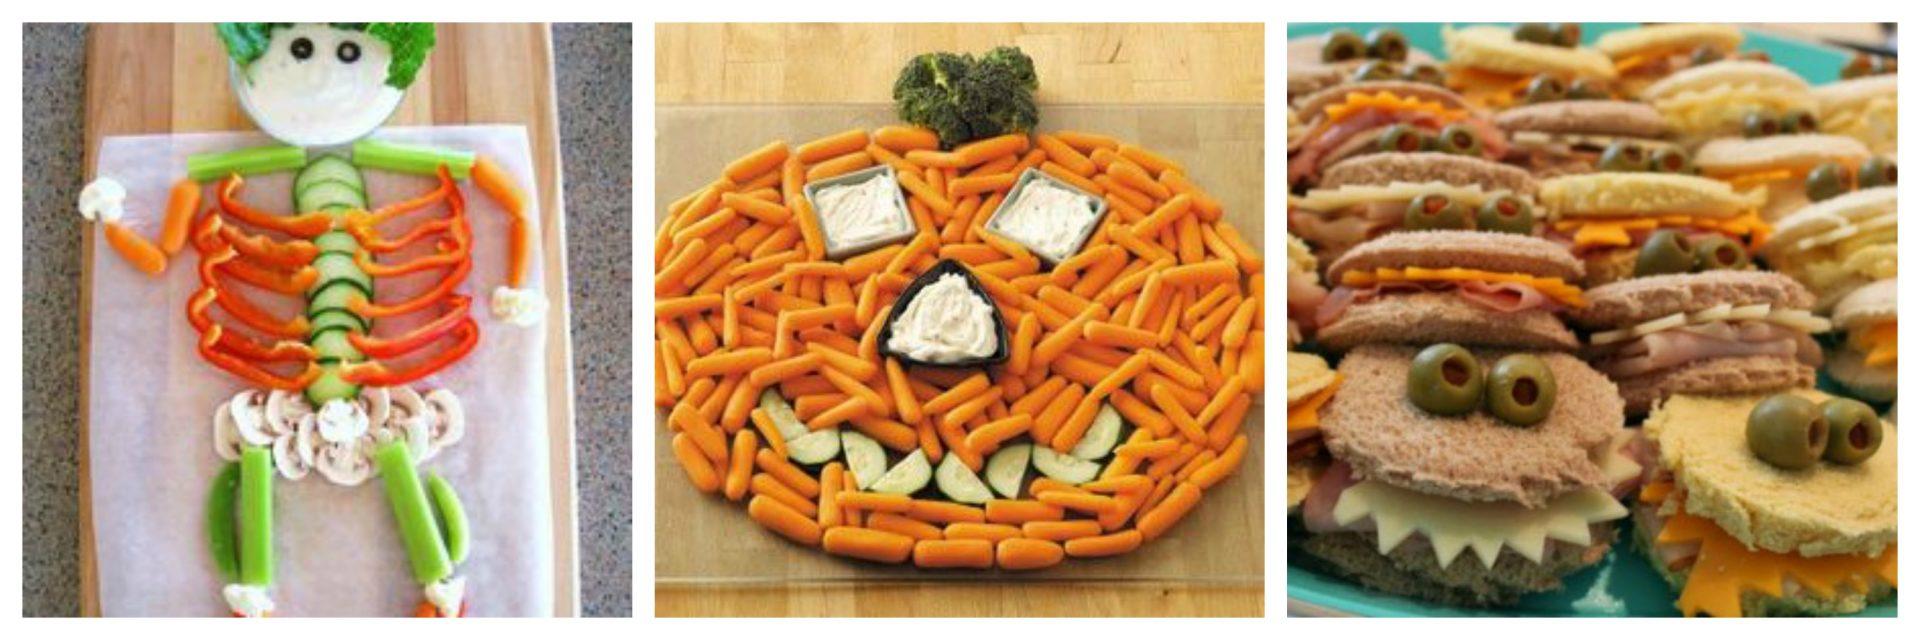 halloween3 - Halloween tricks and treats